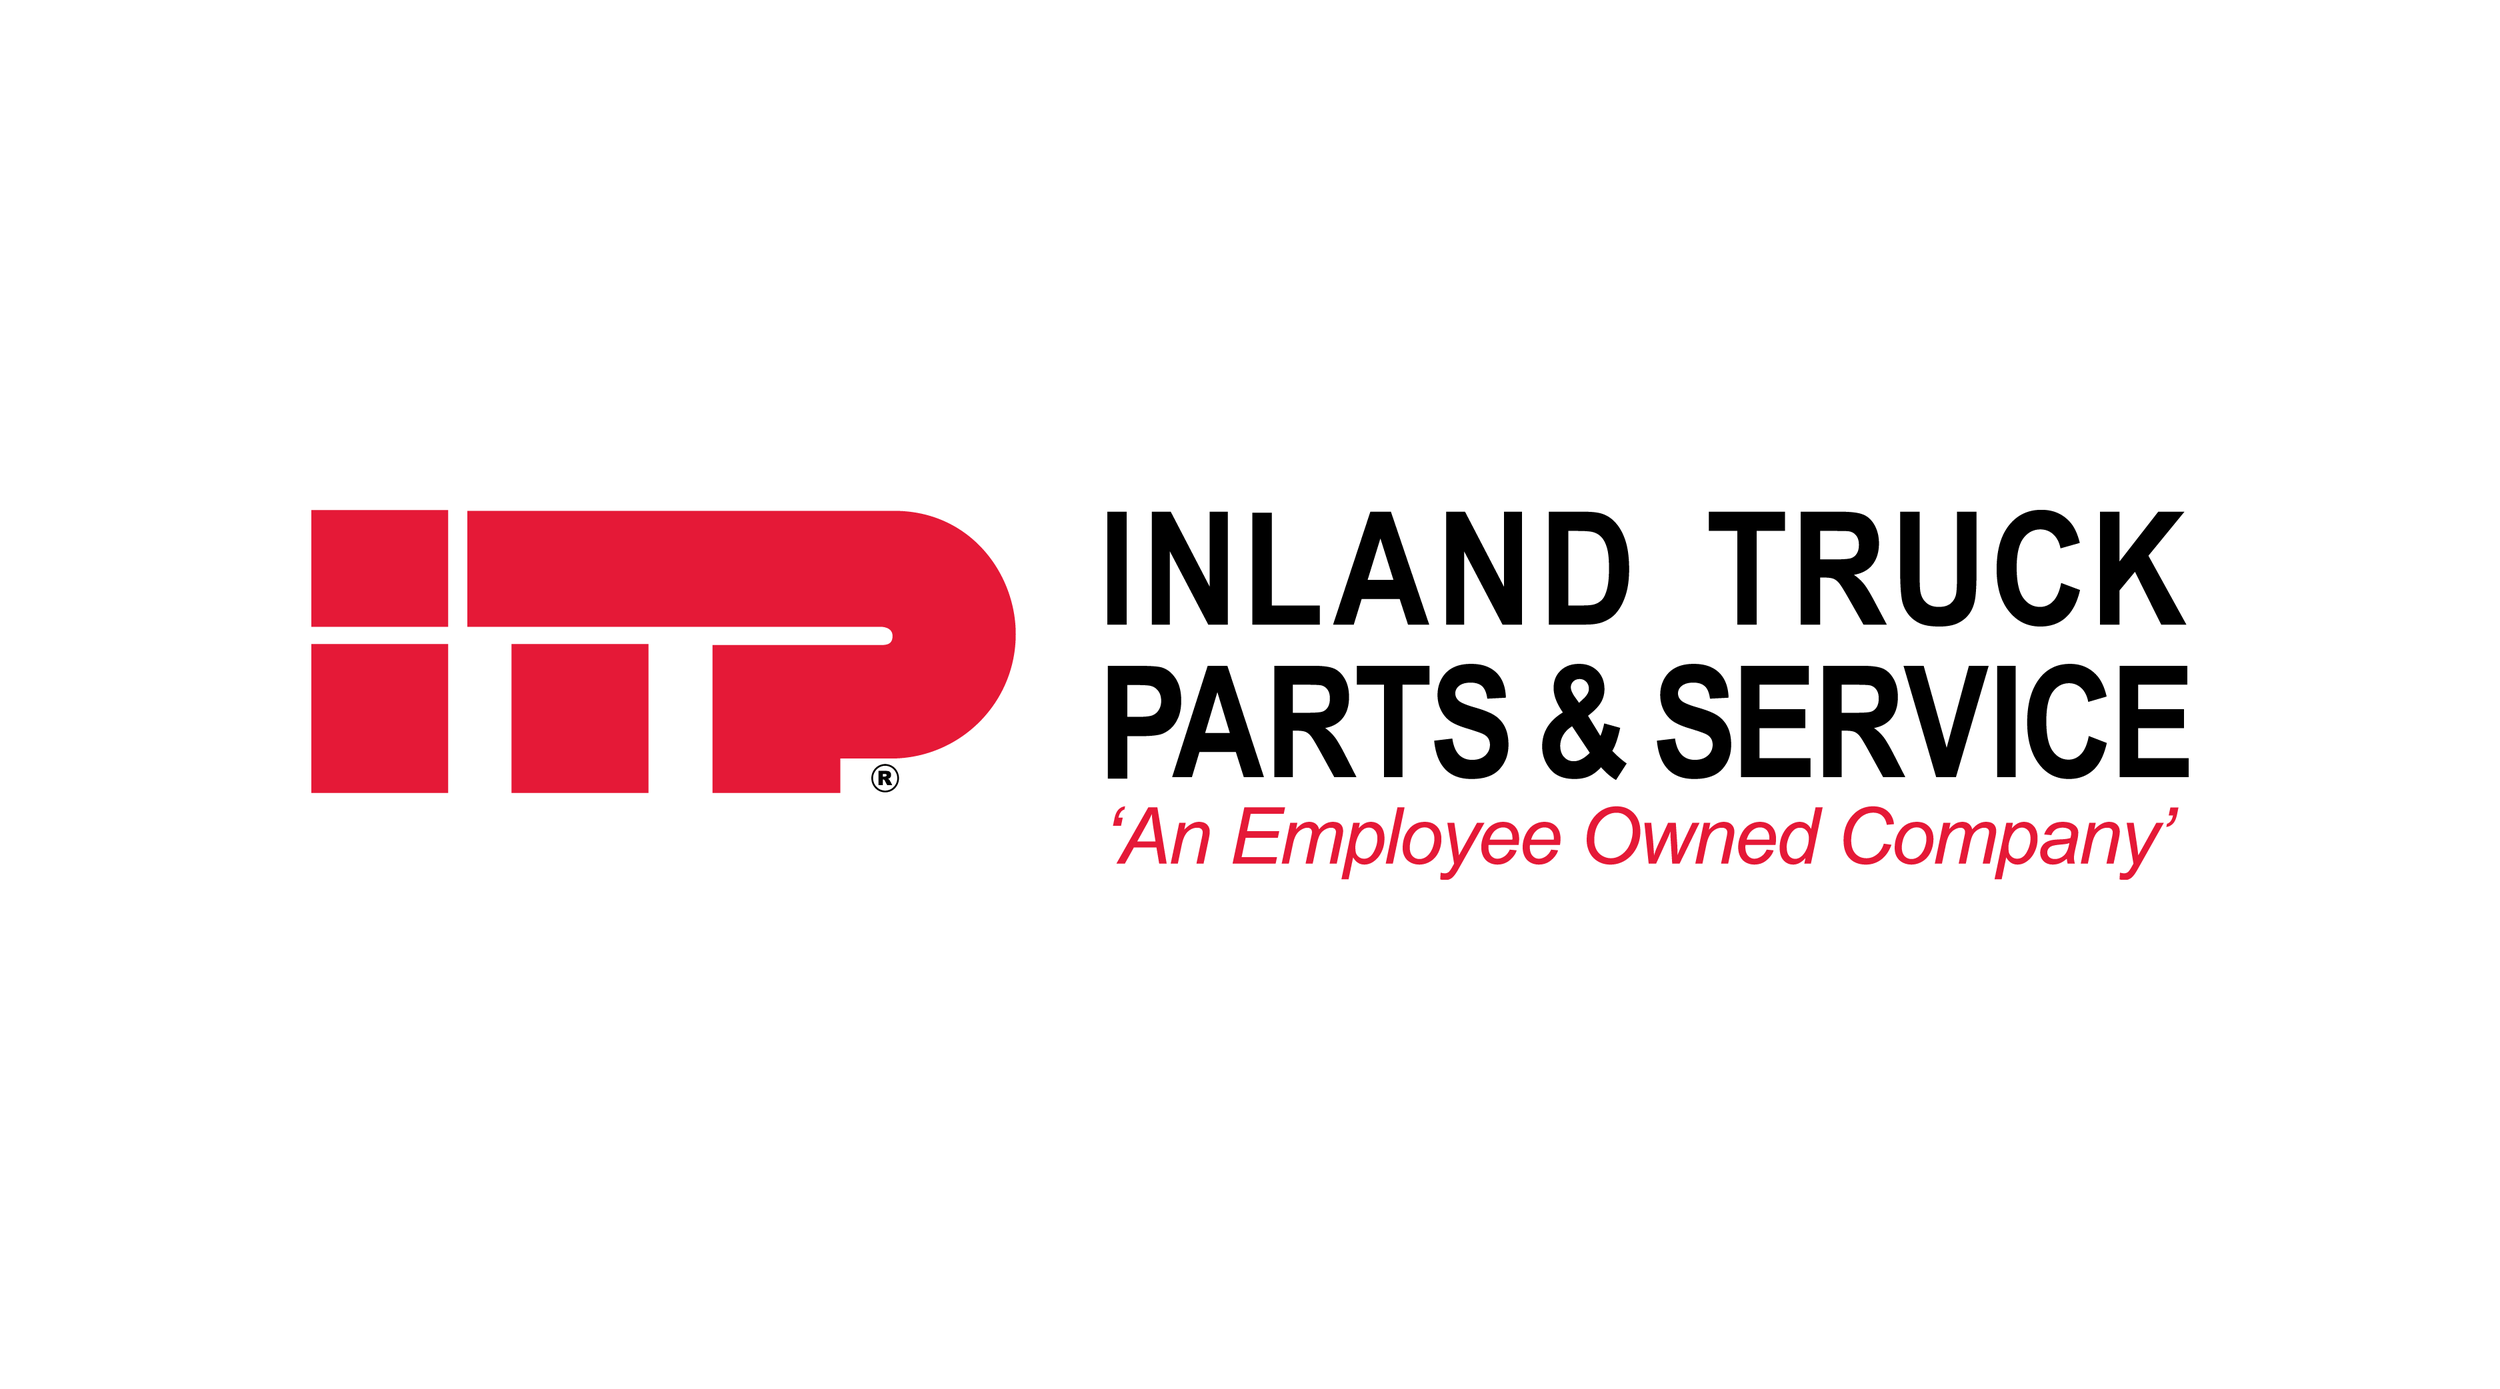 asset-logo_inland-truck-parts-service.png